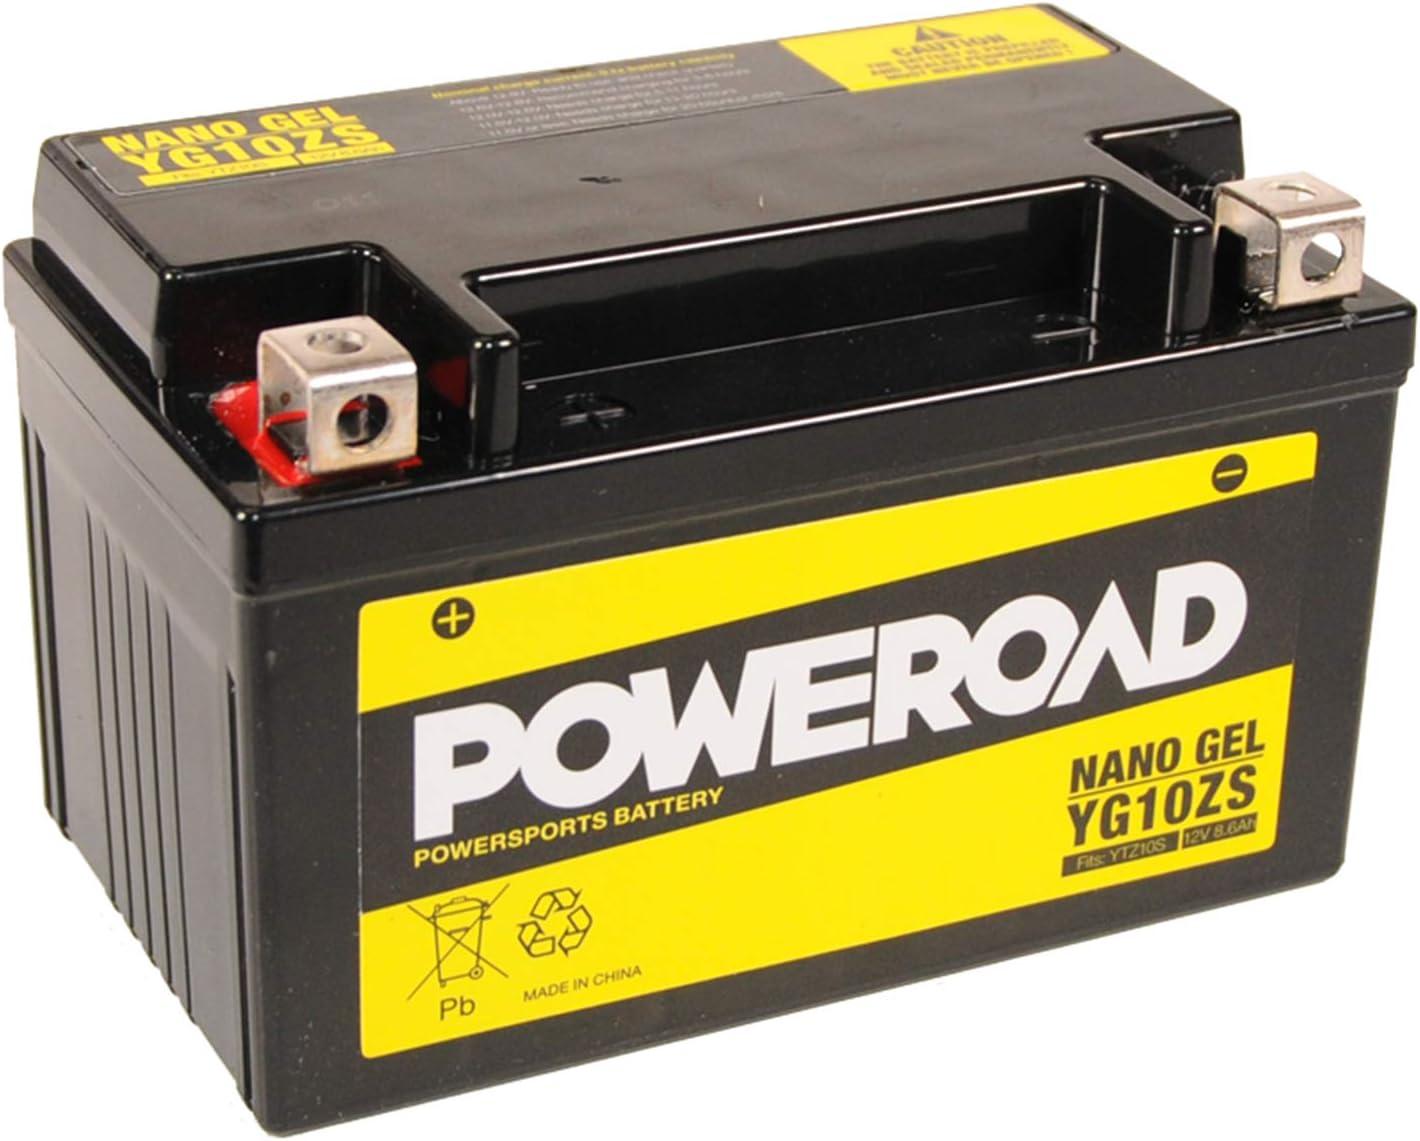 Gel Batterie 12v 8 6 Ah Yg10zs Ytz10 S Für Motorrad Inkl 7 50eur Pfand Auto